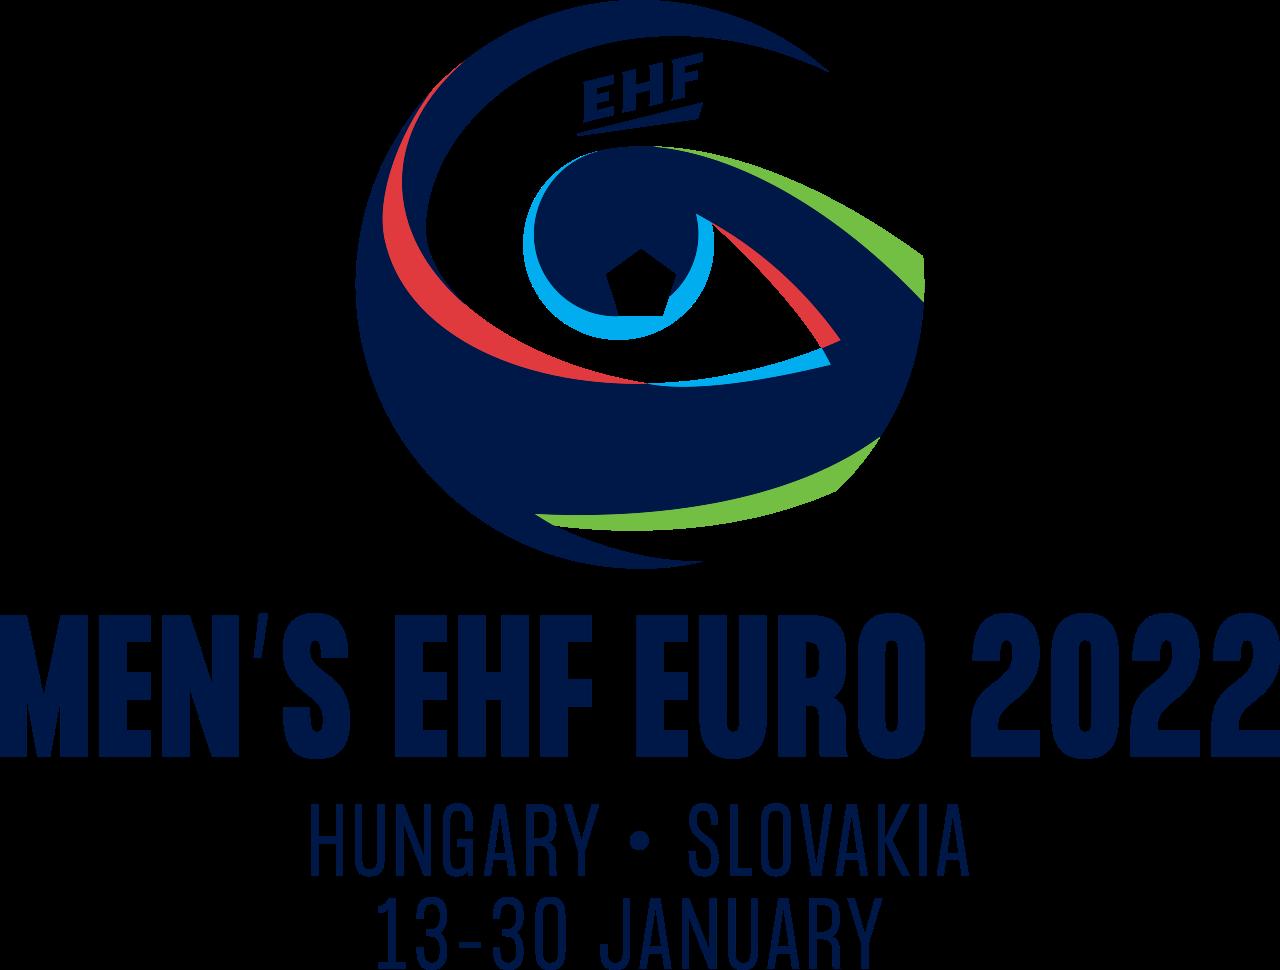 ehf-euro-2022